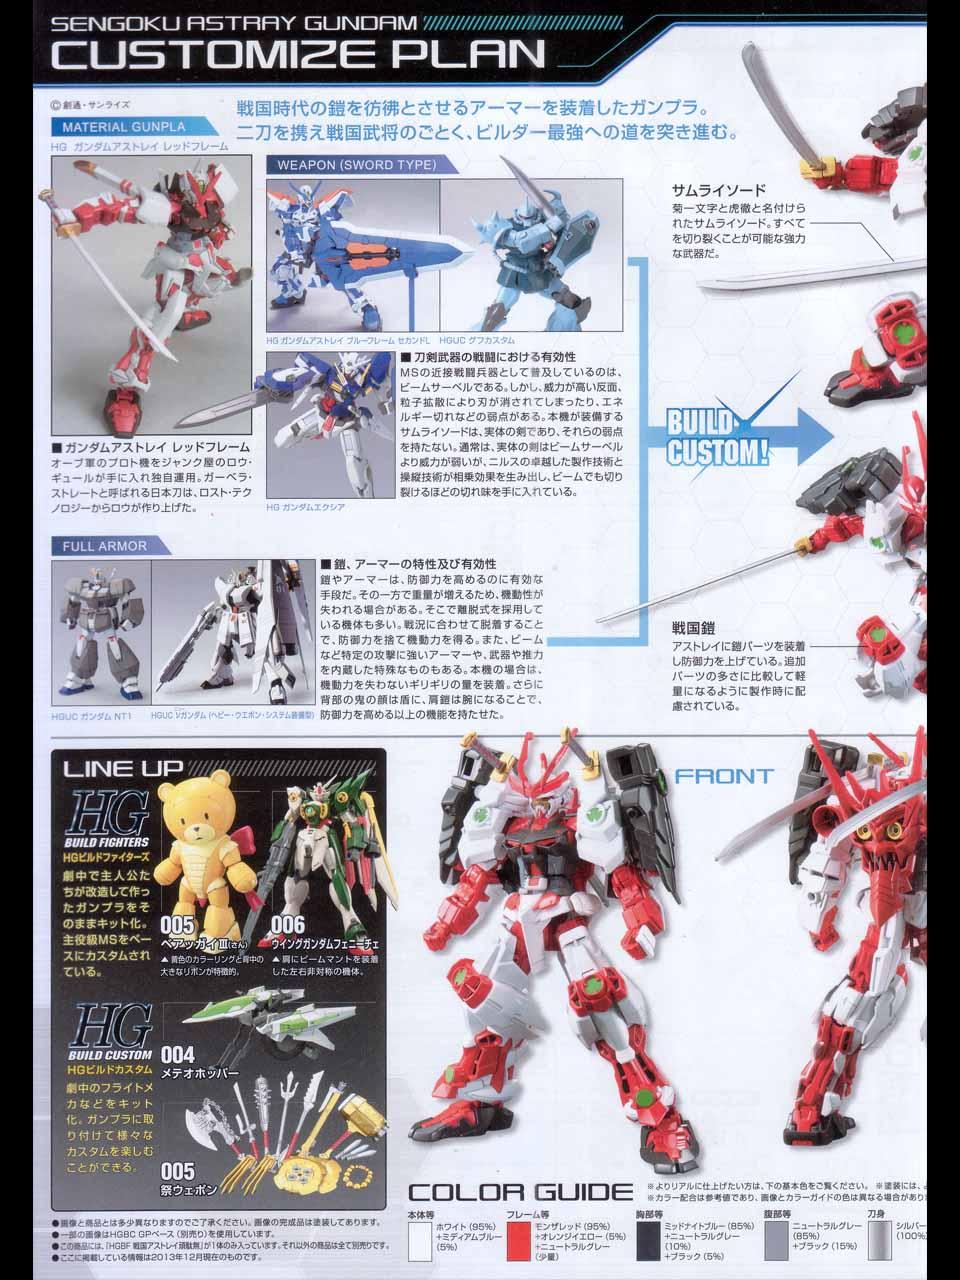 HGBF_Sengoku_Astray_Gundam_11.jpg